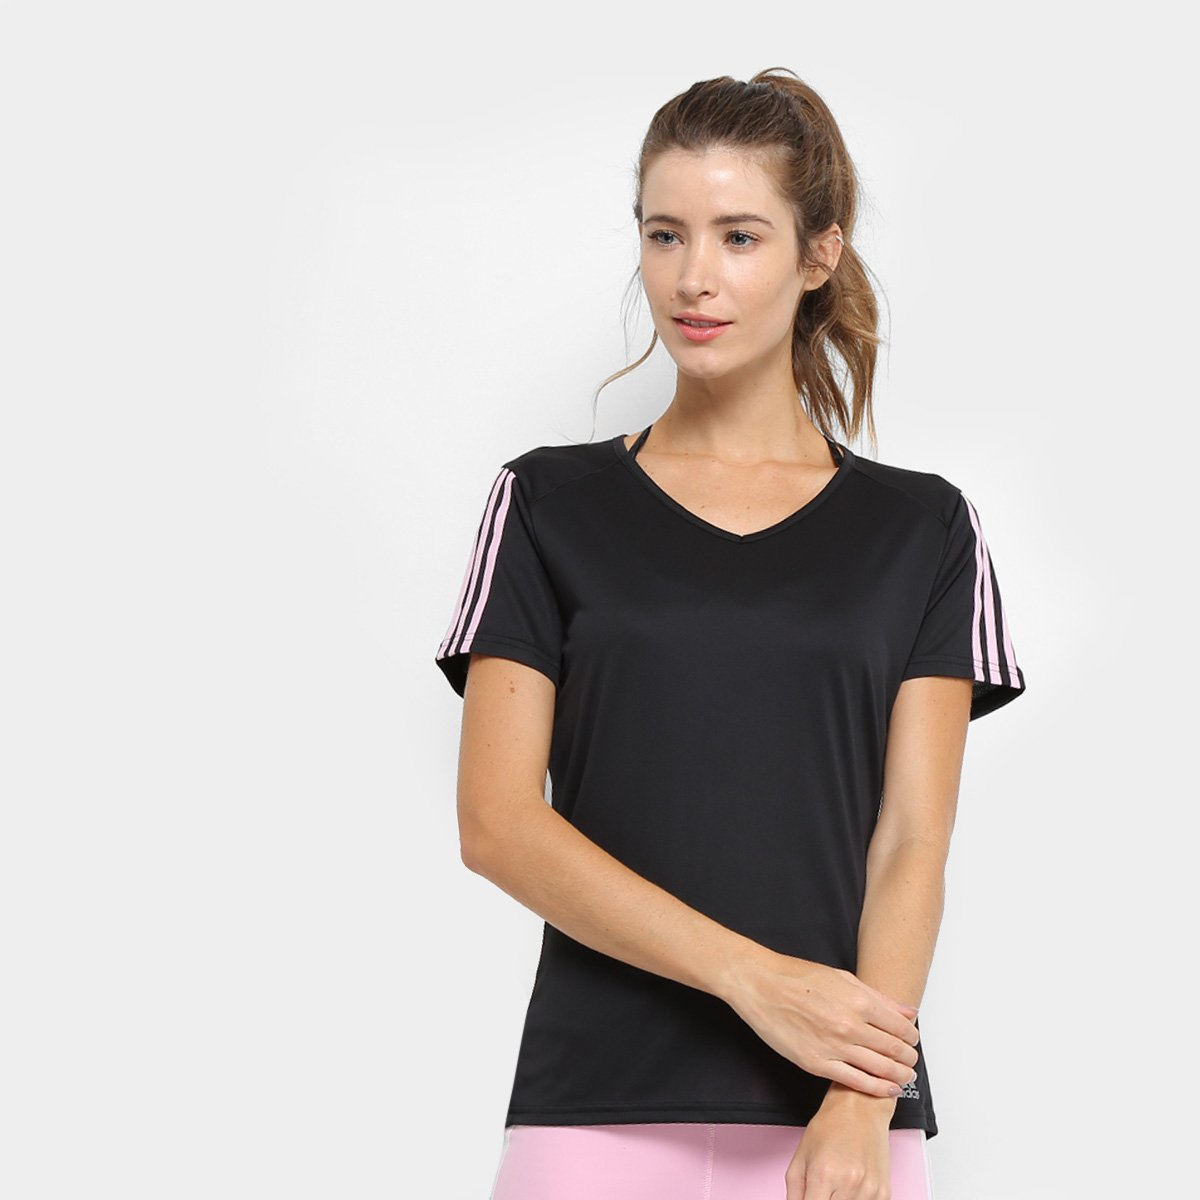 d283970790 Camiseta Adidas Run 3S Feminino